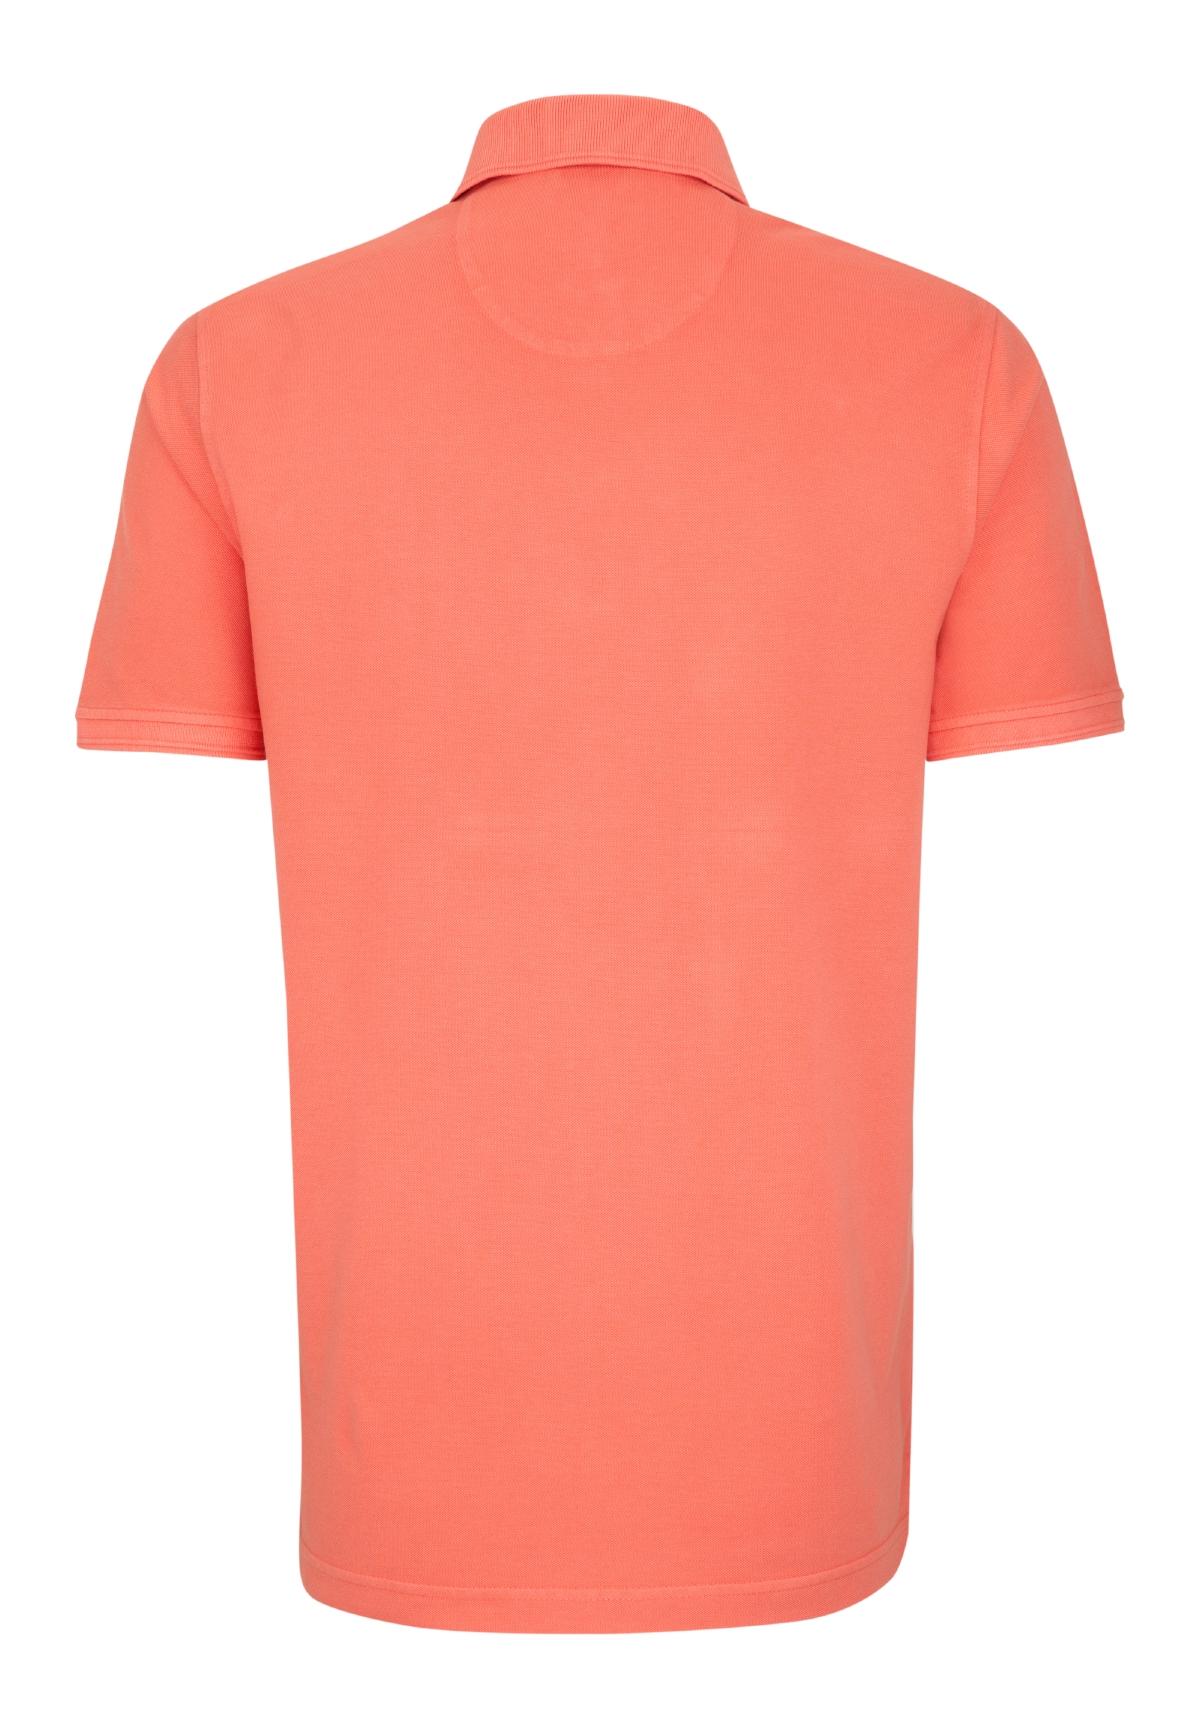 Camel-Active-Herren-Shirt-Poloshirt-Pique-Regular-Fit-NEU Indexbild 63